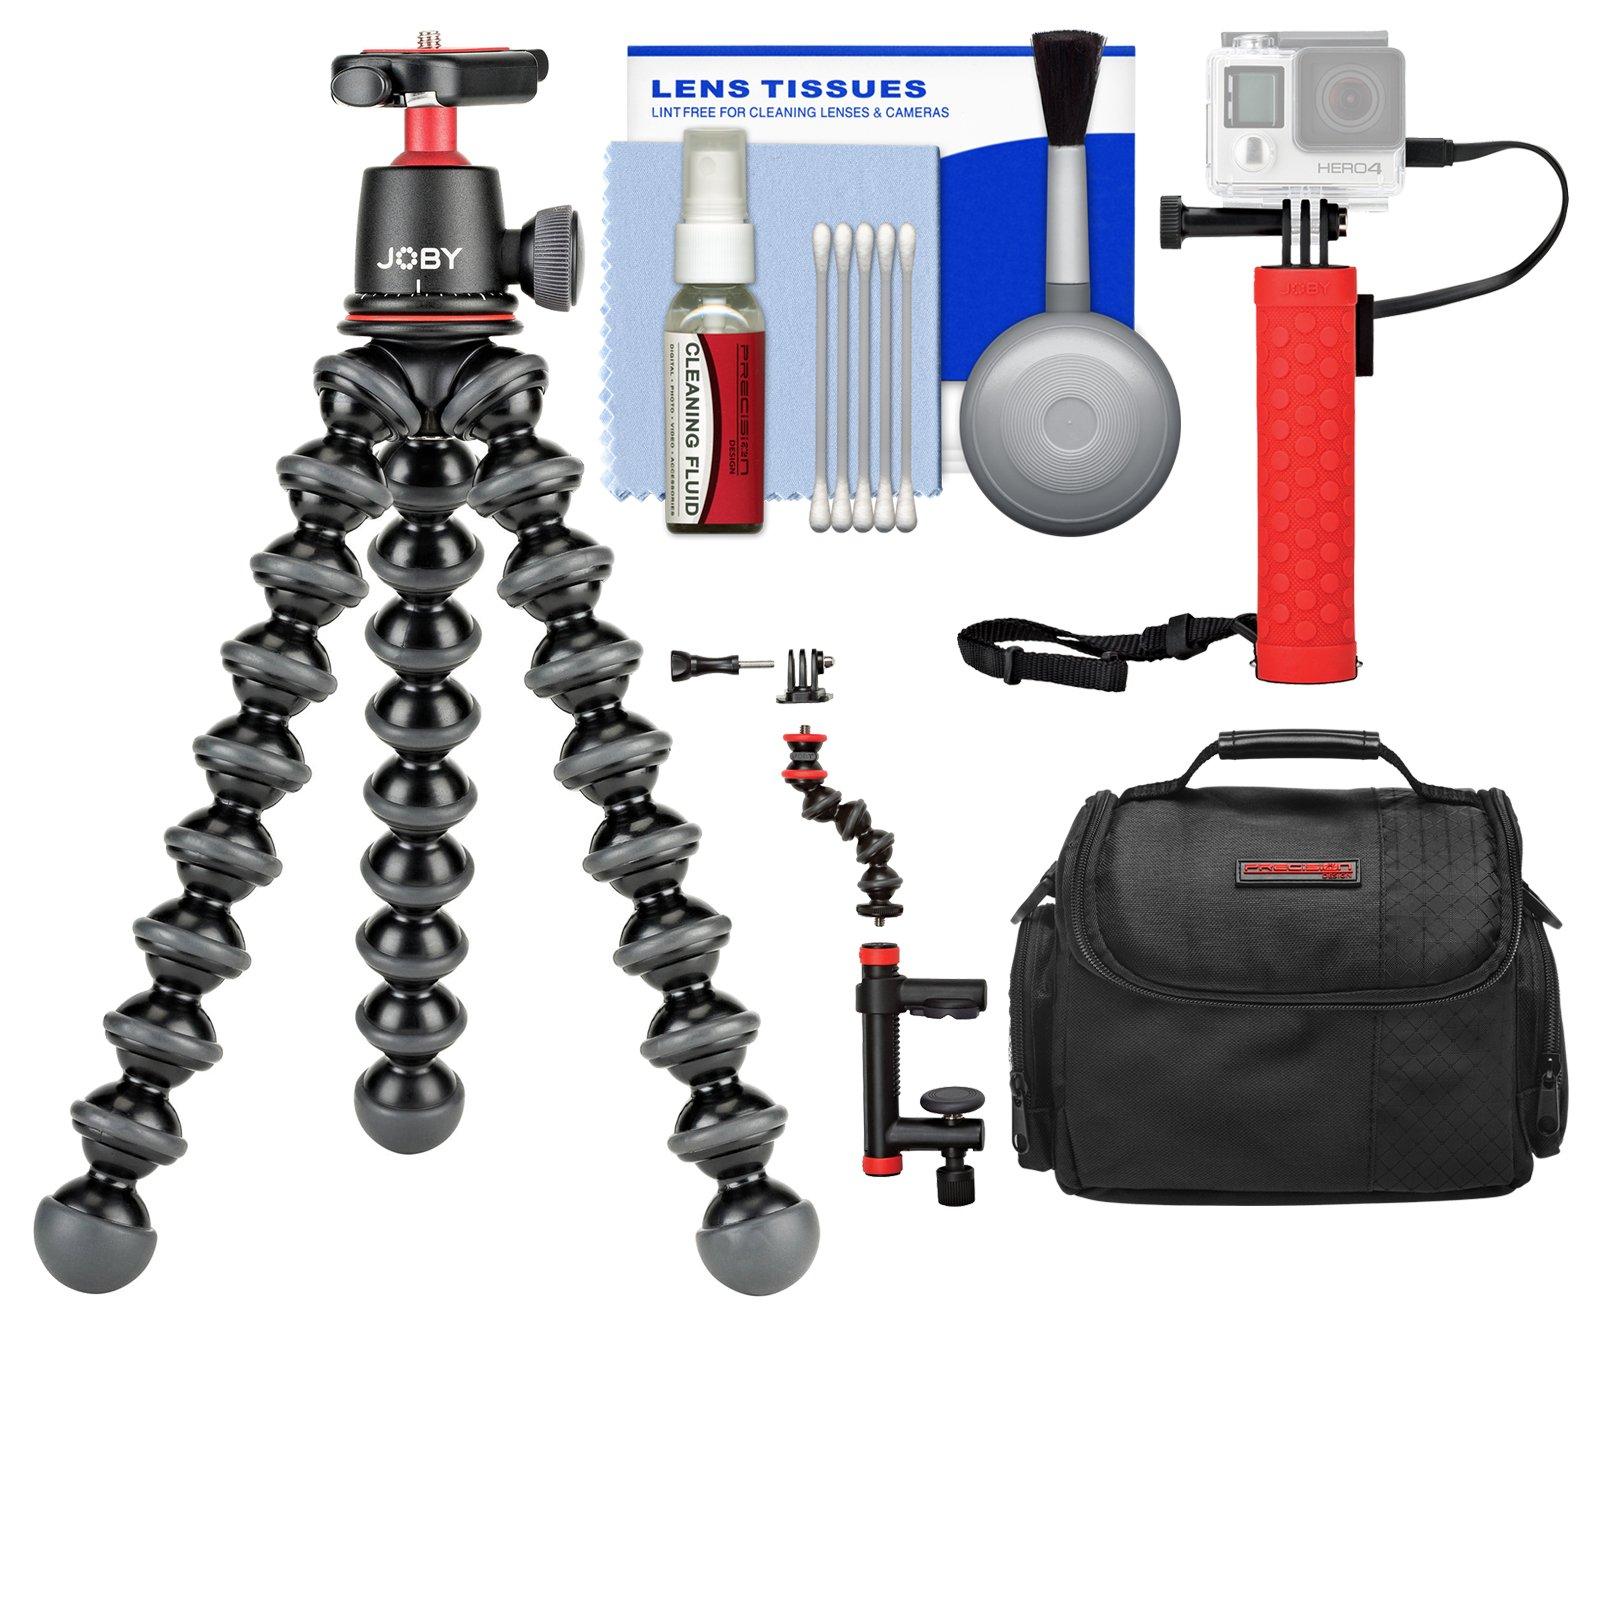 Joby GorillaPod 3K Flexible Mini Tripod with Ball Head Kit + Case + Hand Grip + Action Camera Clamp + Kit by Joby